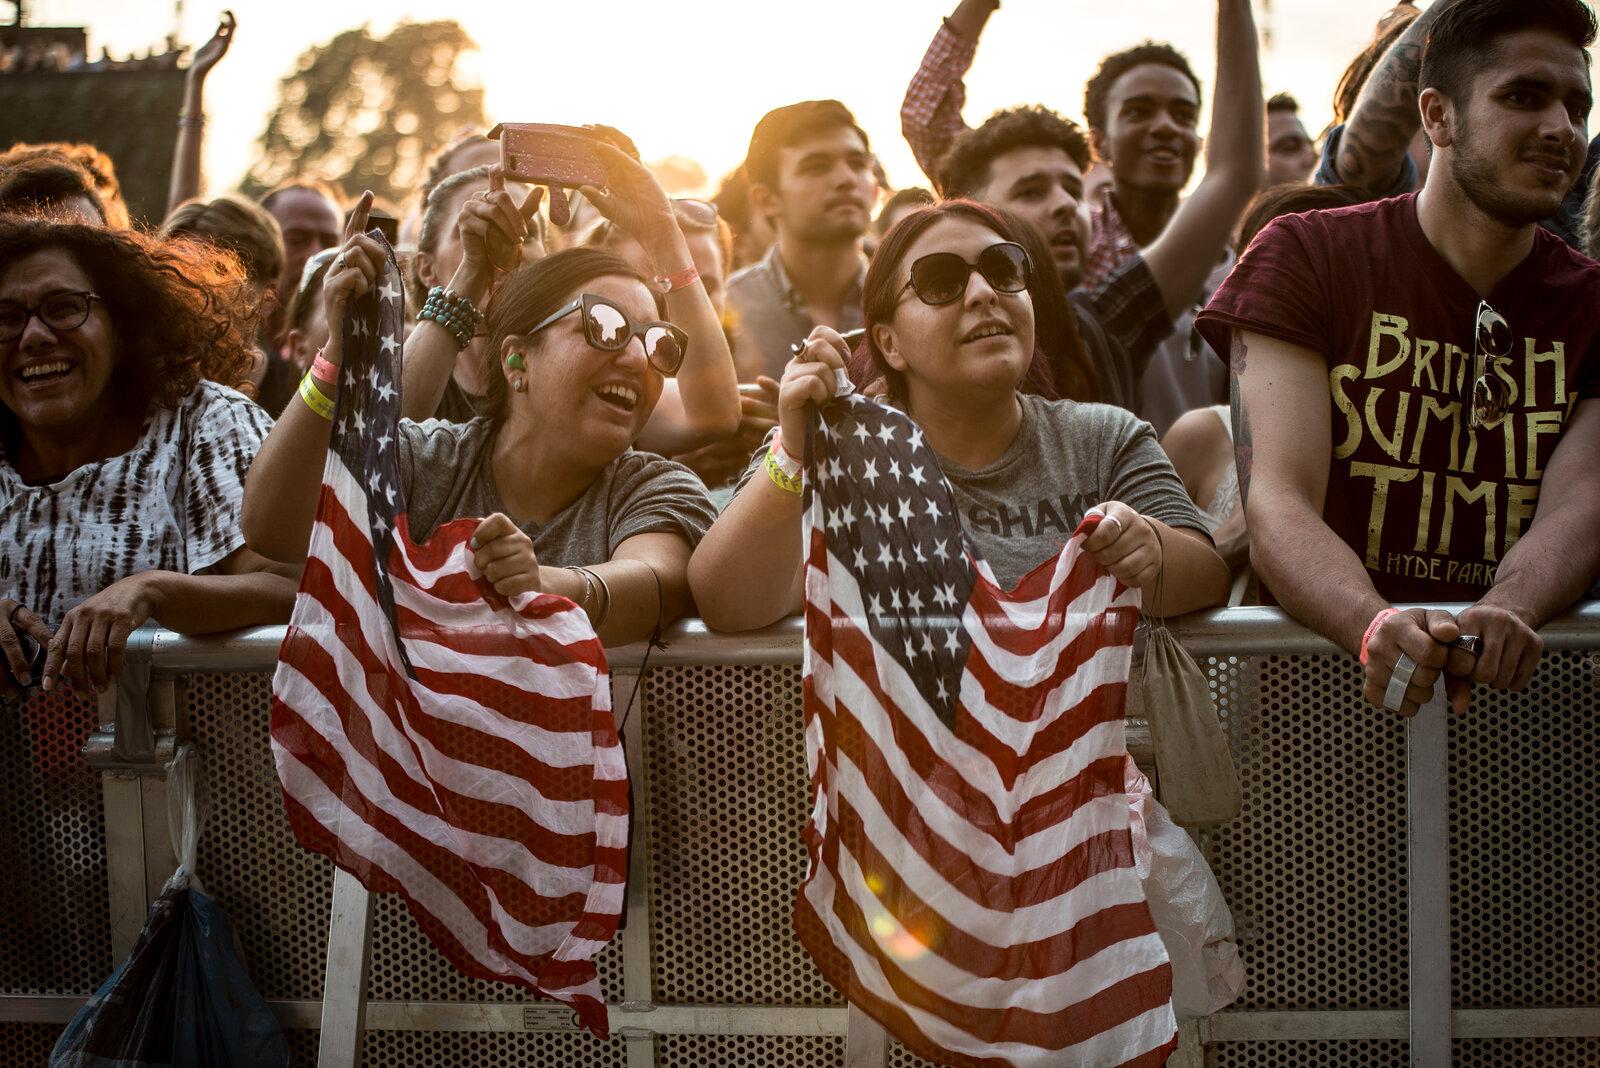 Barclaycard Presents British Summer Time Festival 2017